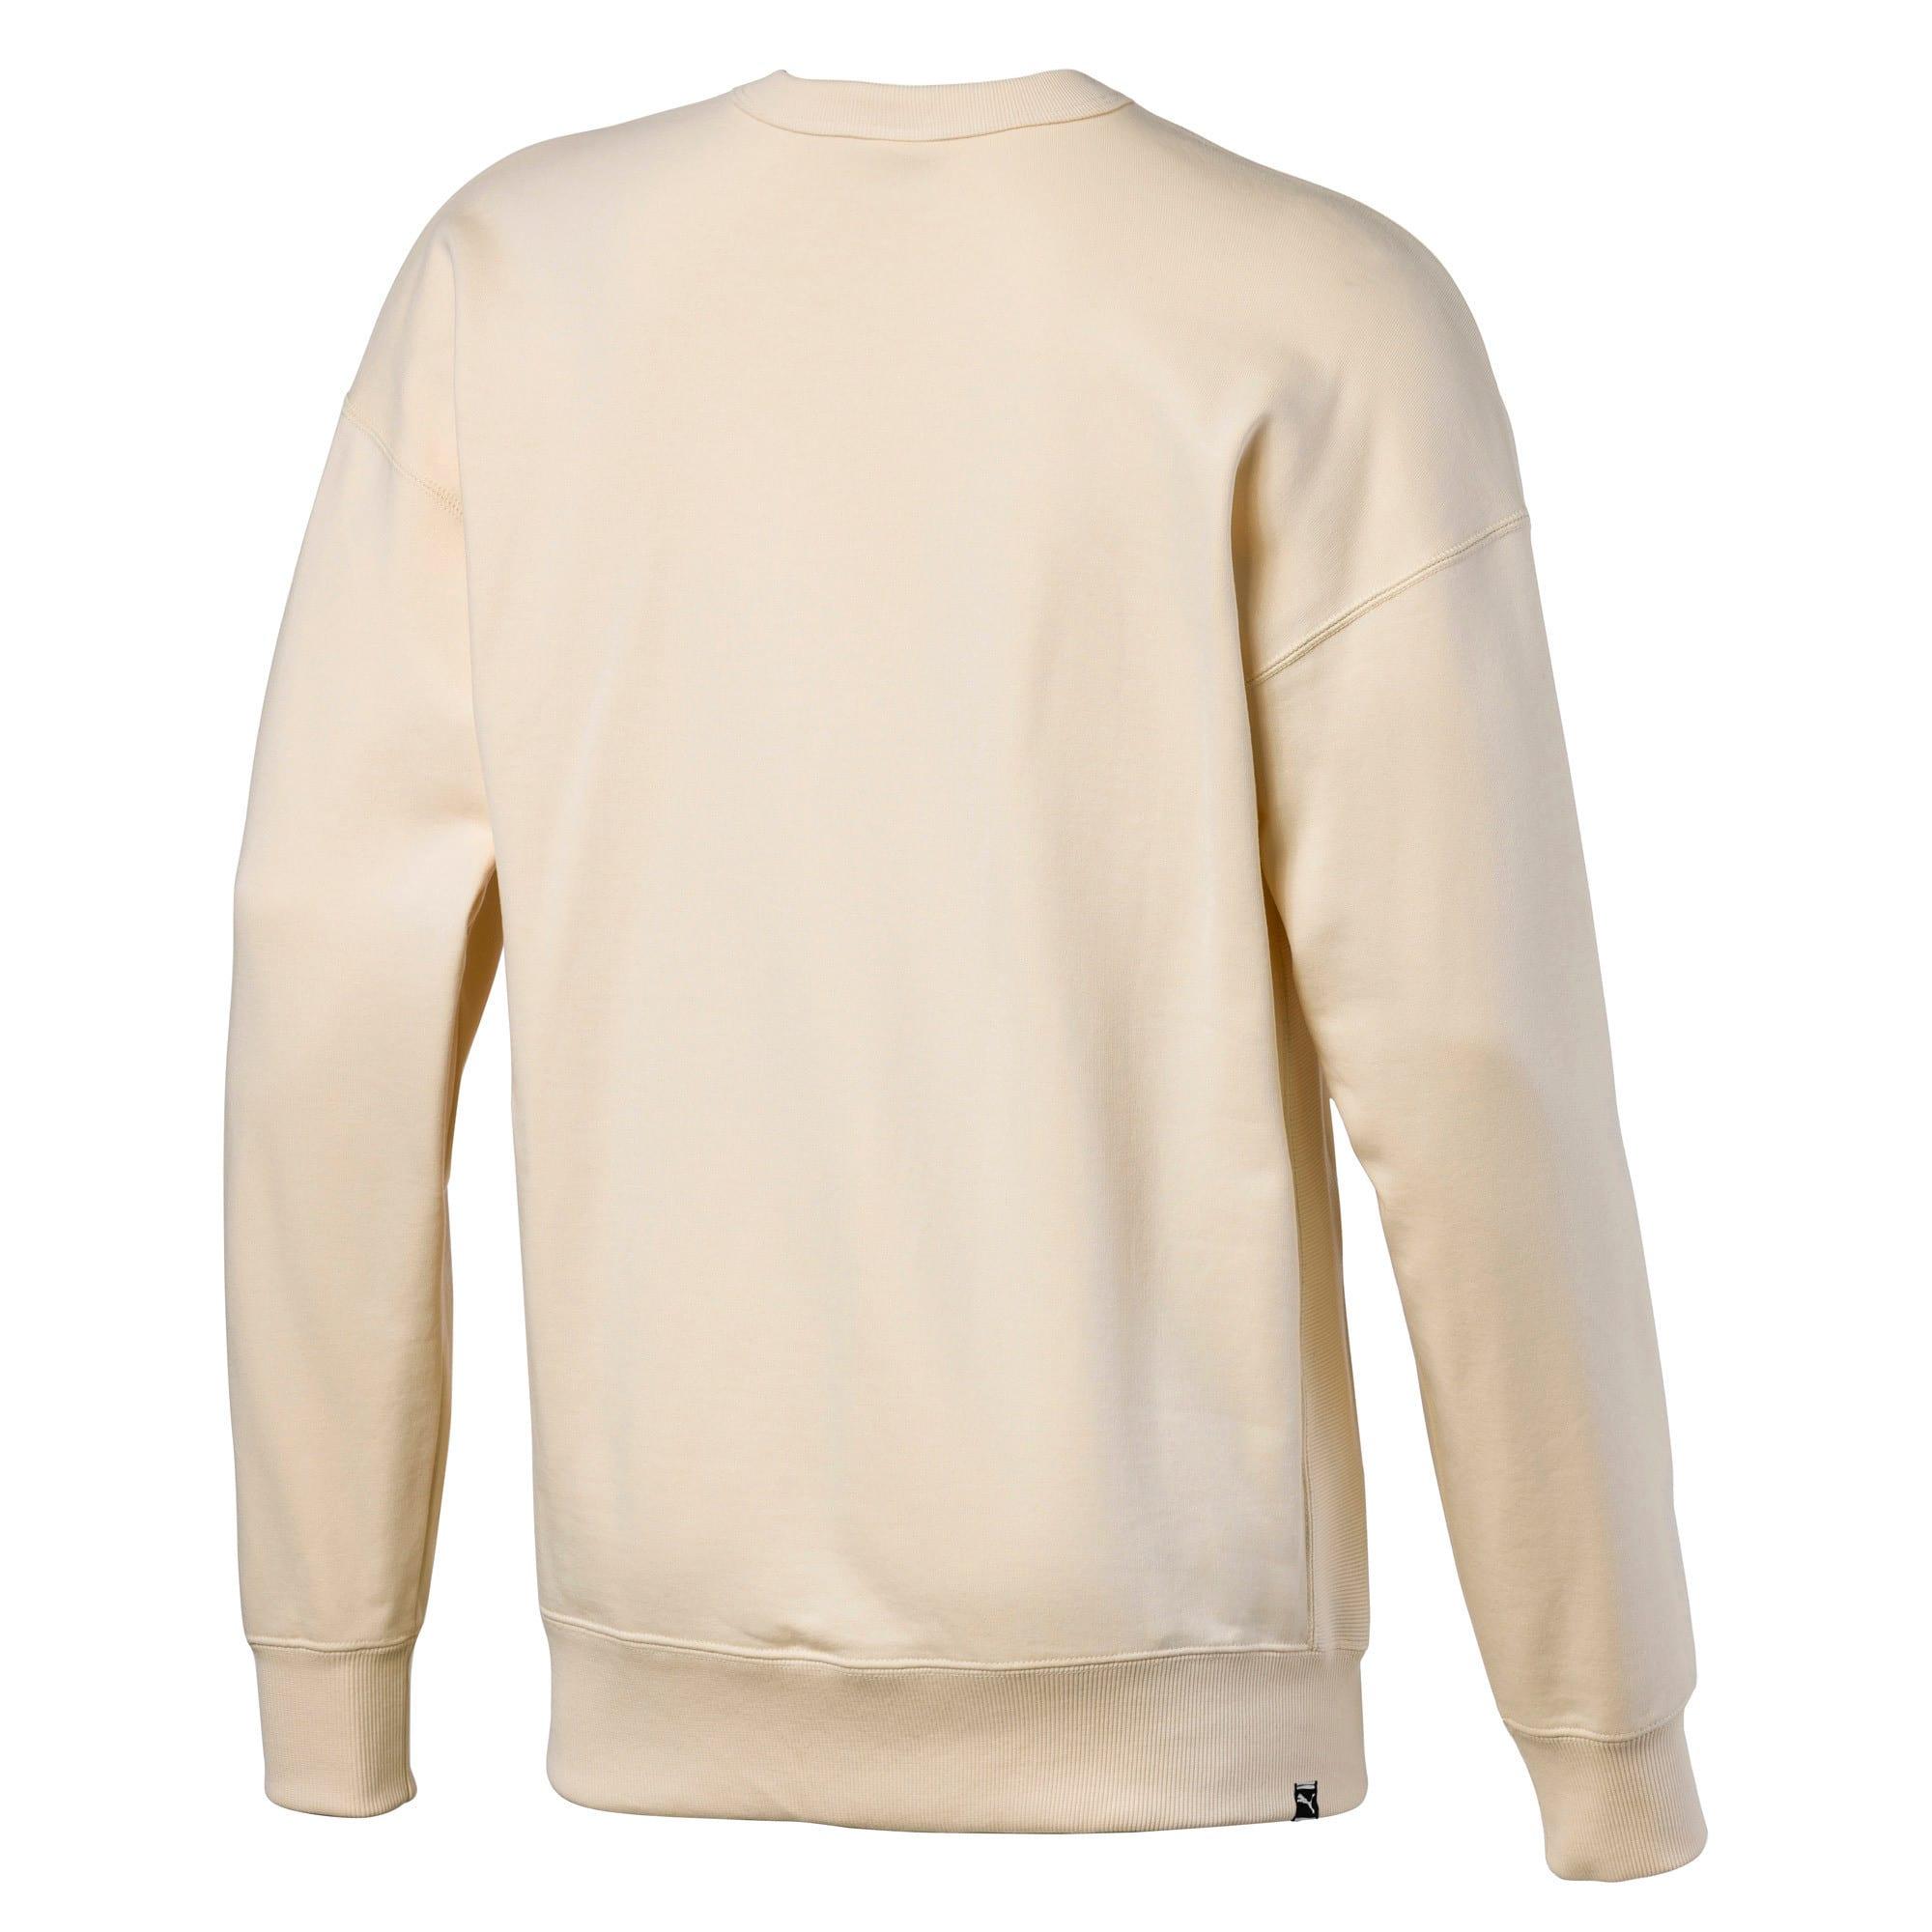 Thumbnail 5 of Downtown Men's Crewneck Sweatshirt, White Smoke, medium